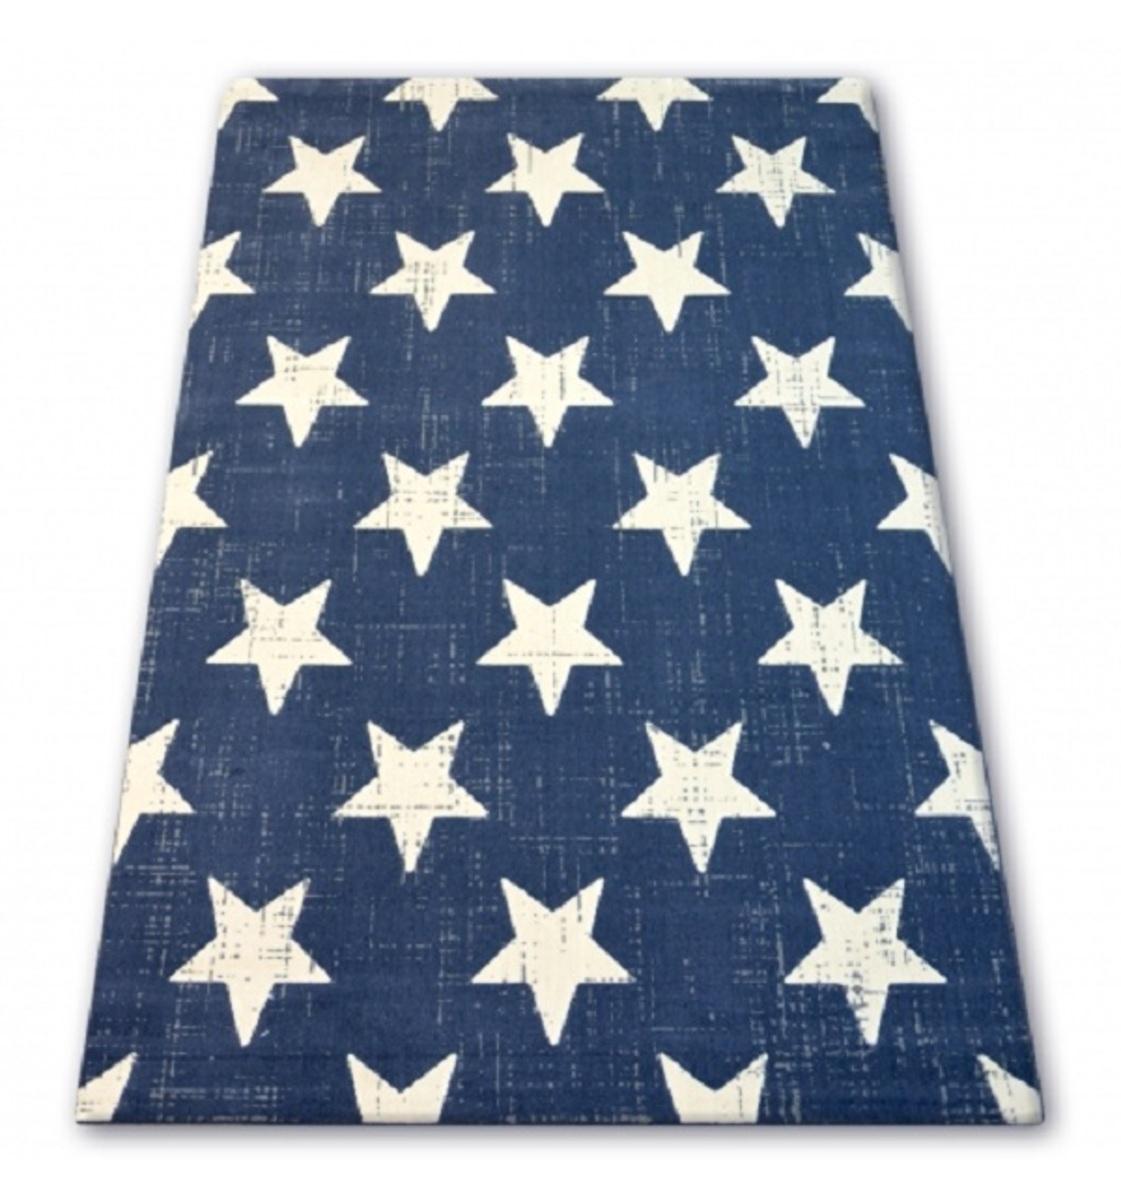 Detský koberec modrý - biele hviezdičky 140 x 200 cm